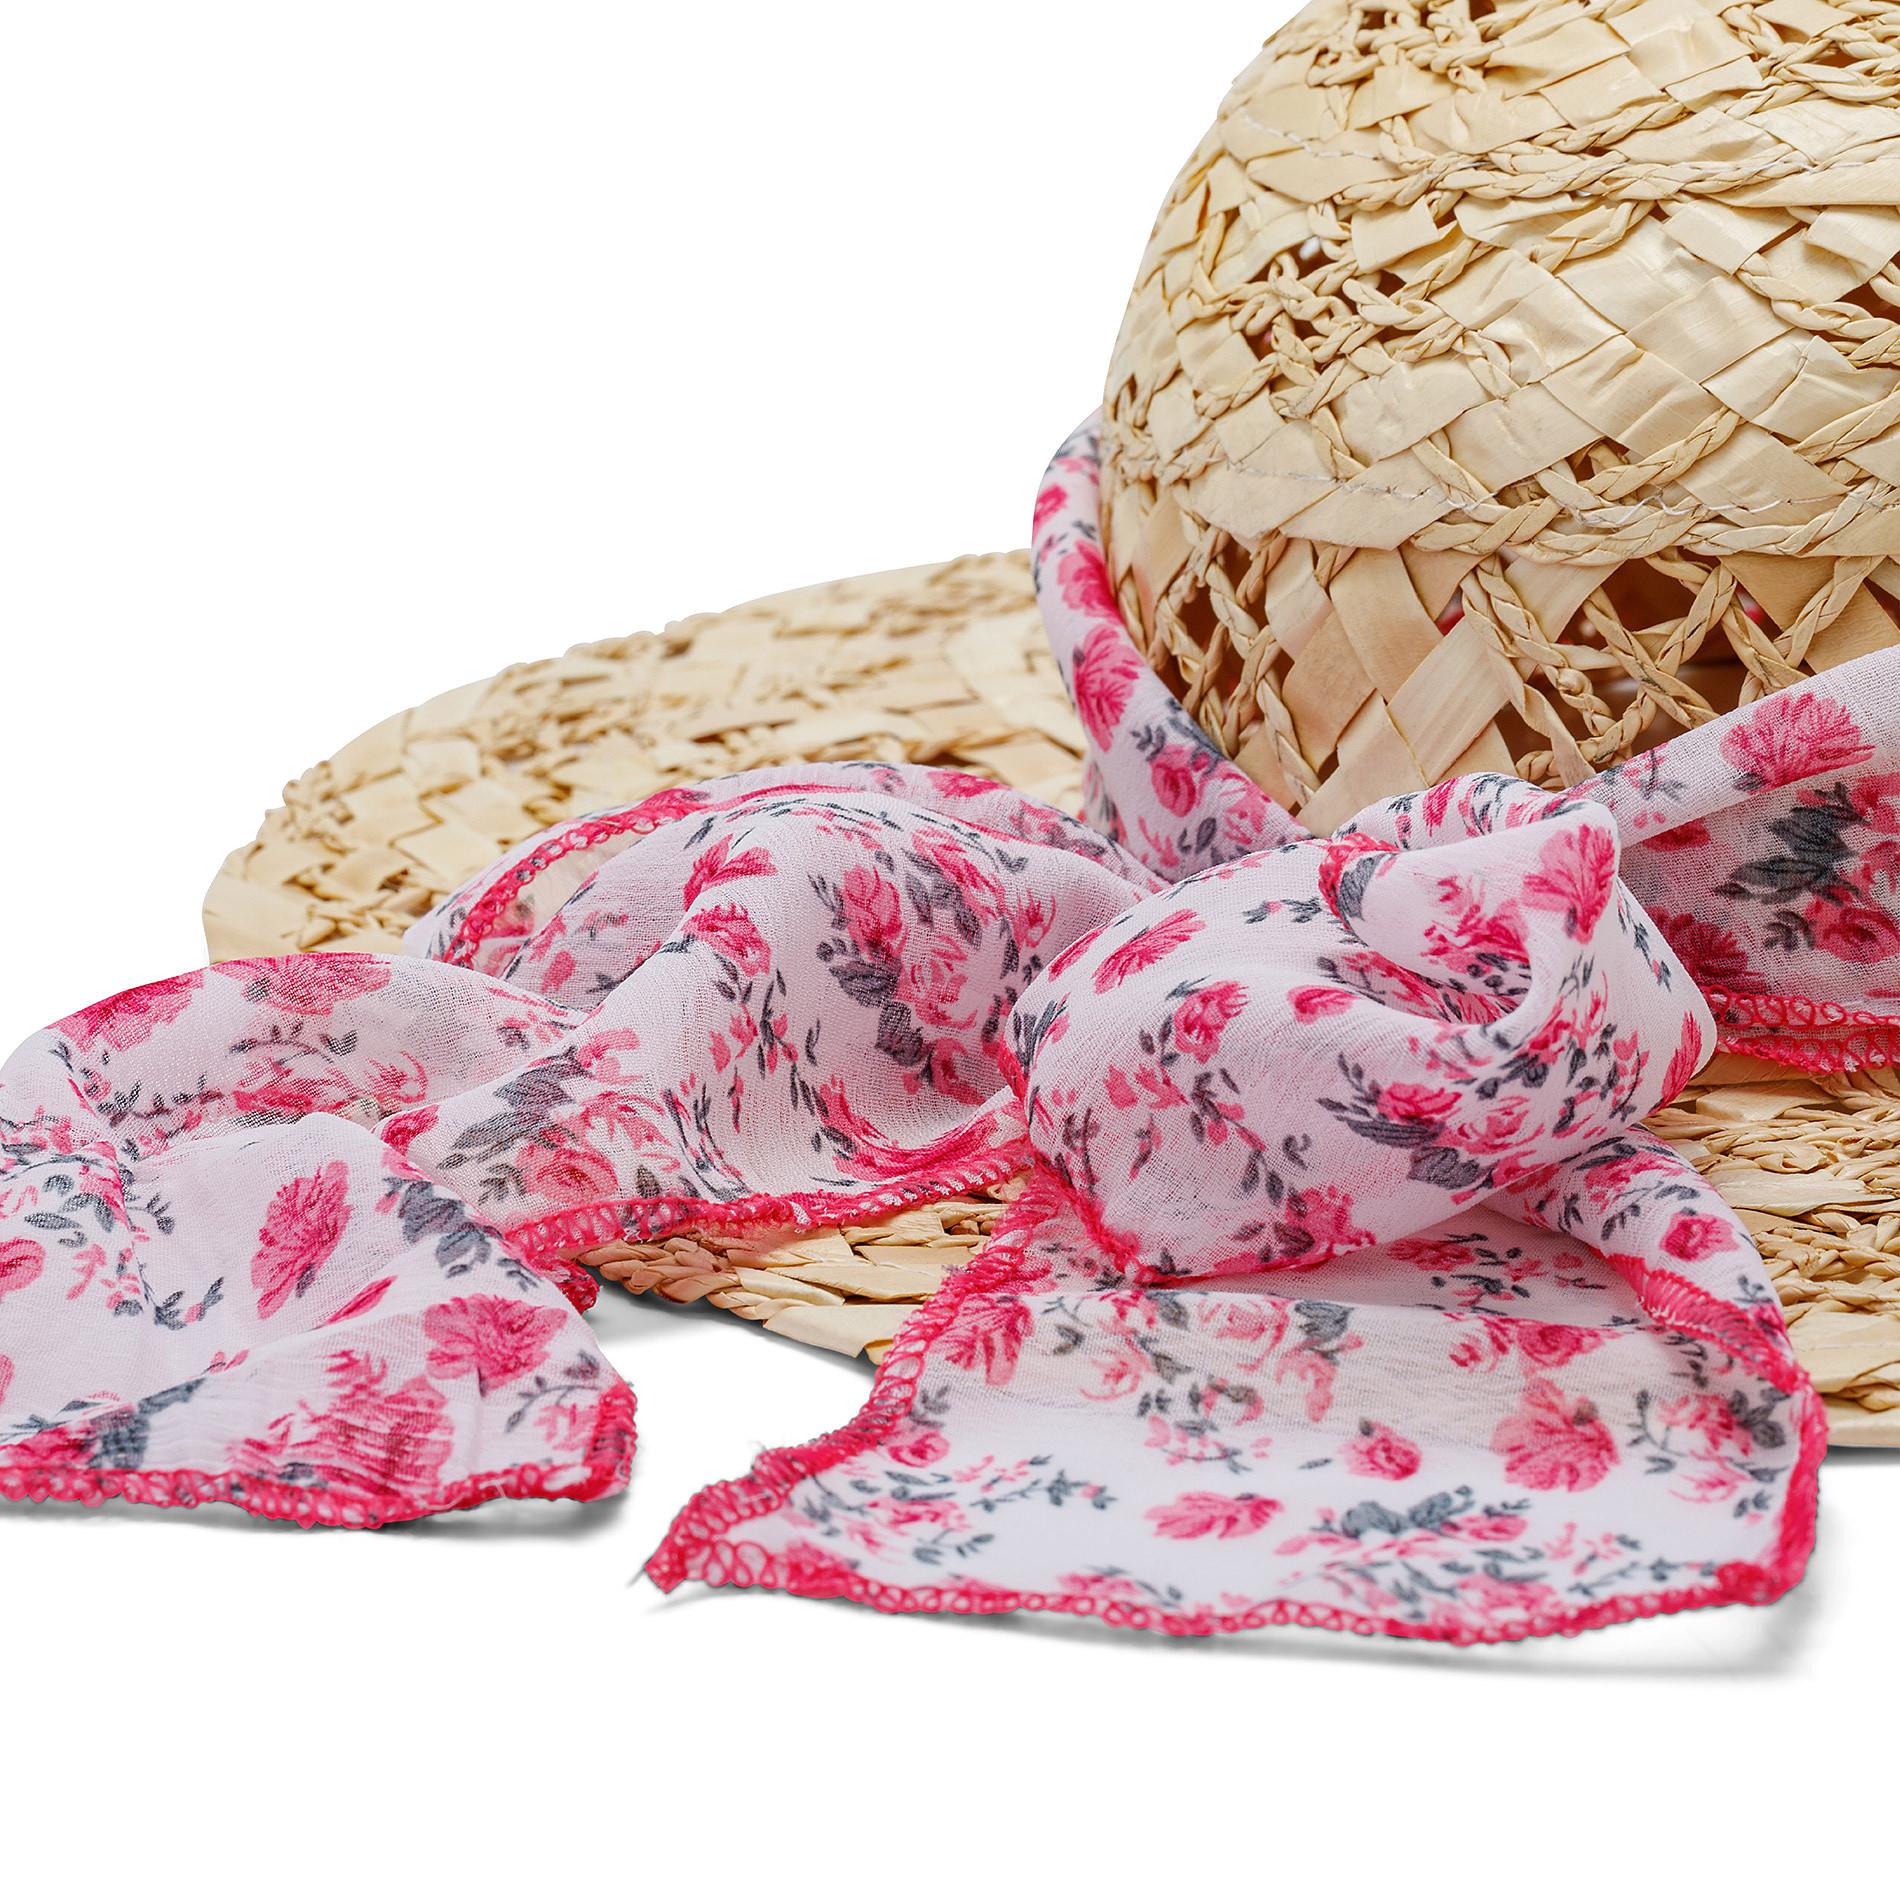 Cappello di paglia con foulard fantasia Koan, Beige, large image number 1